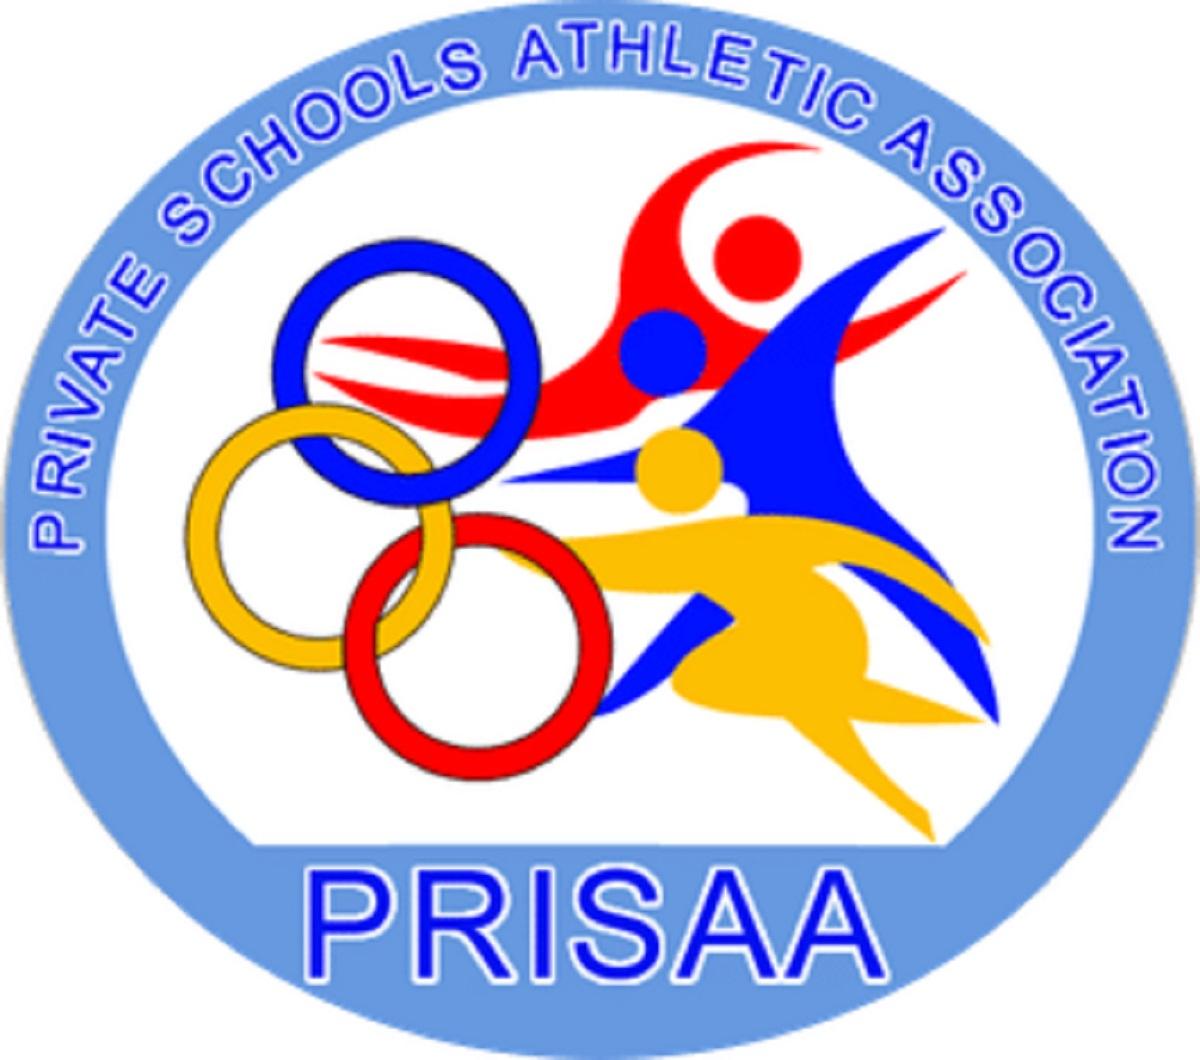 2020 PRISAA CV Athletics Rare Results 5